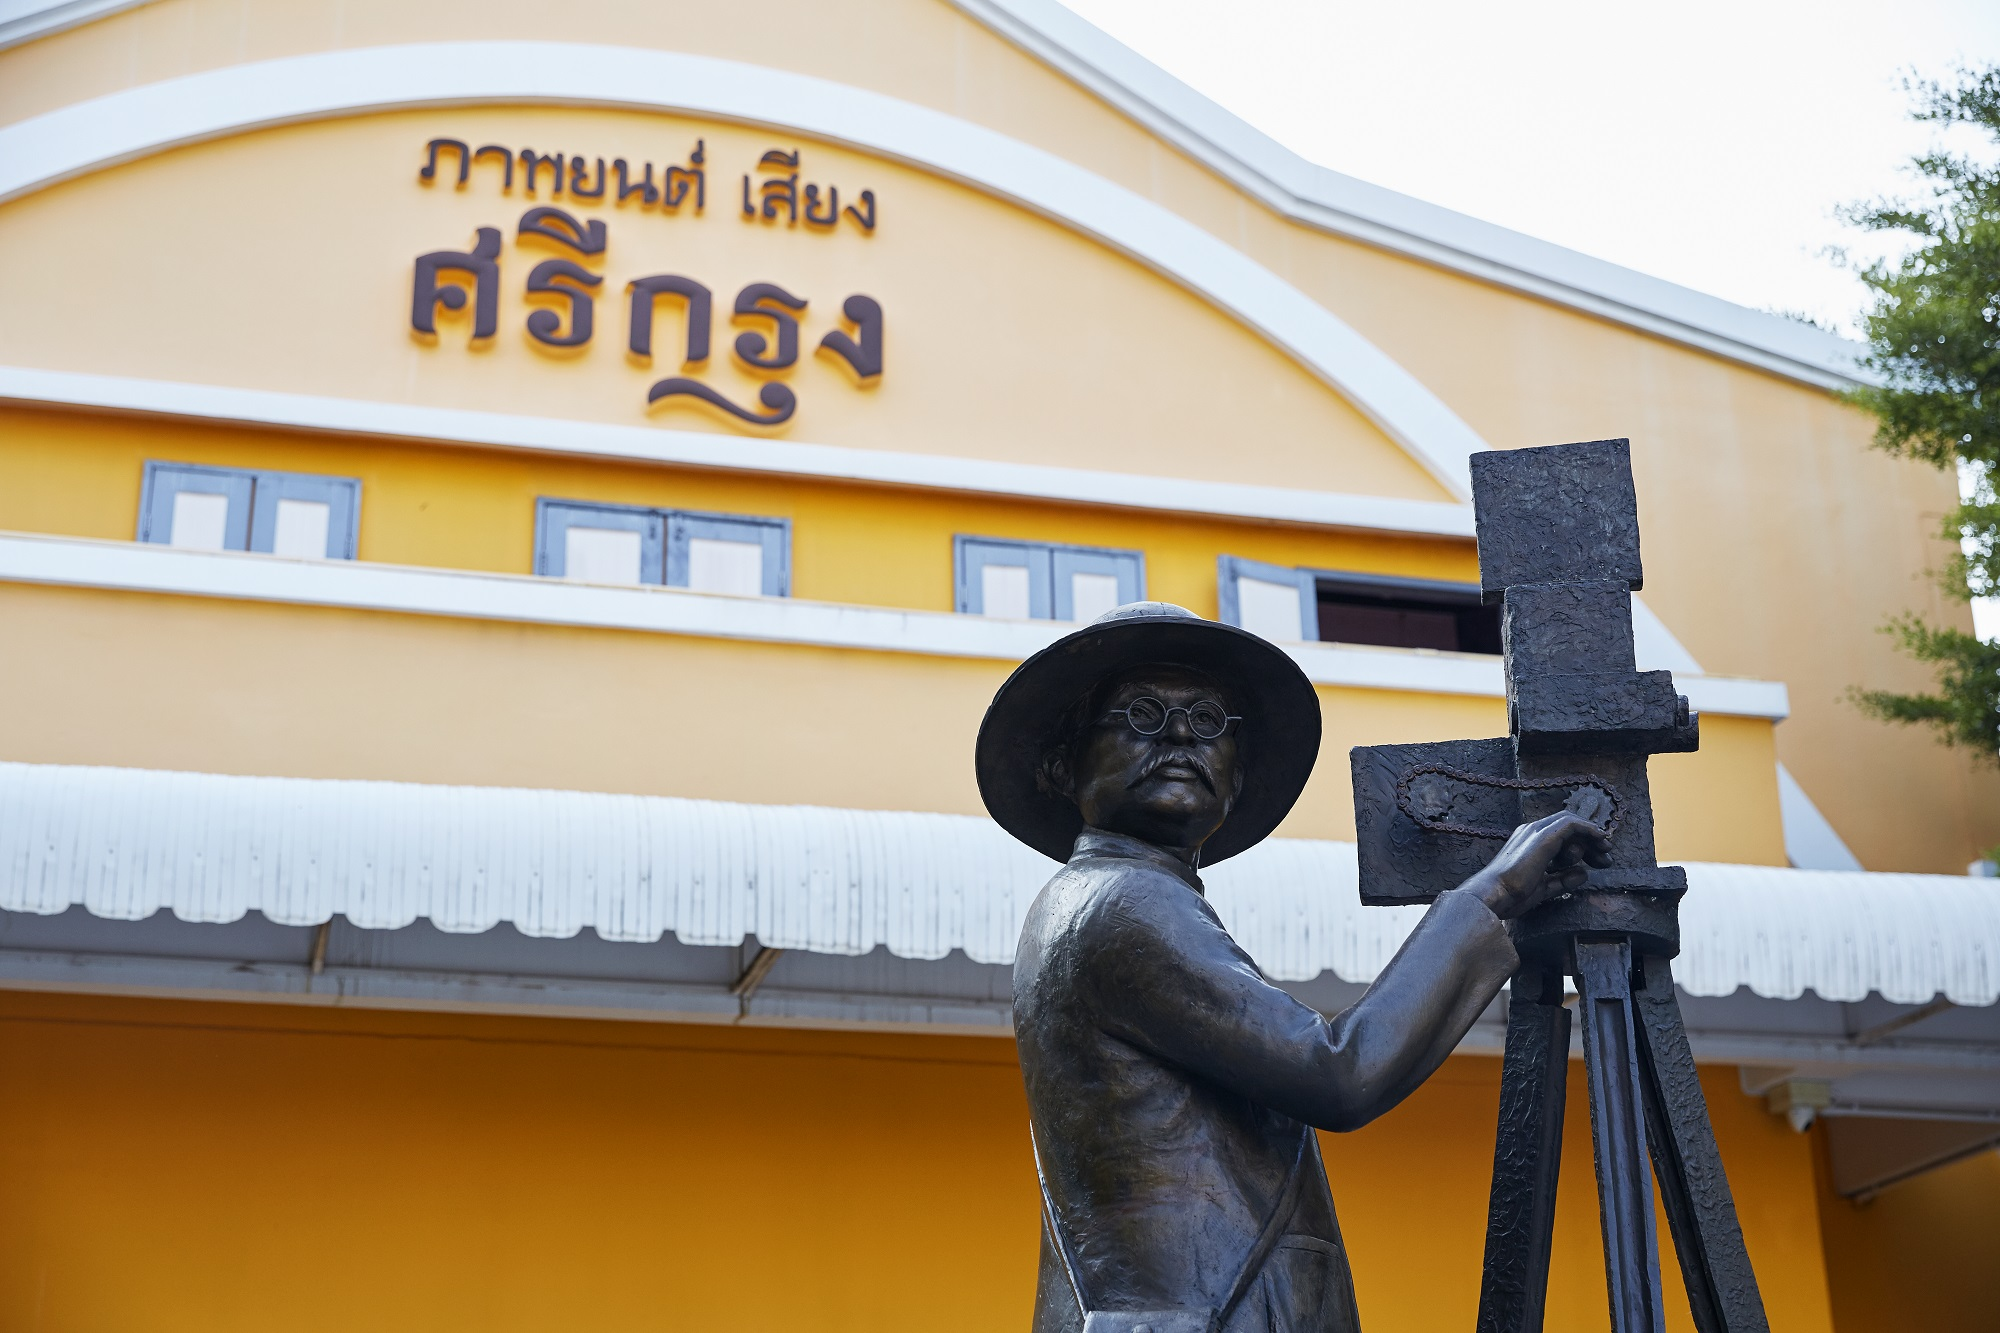 THAILAND FILM ARCHIVE